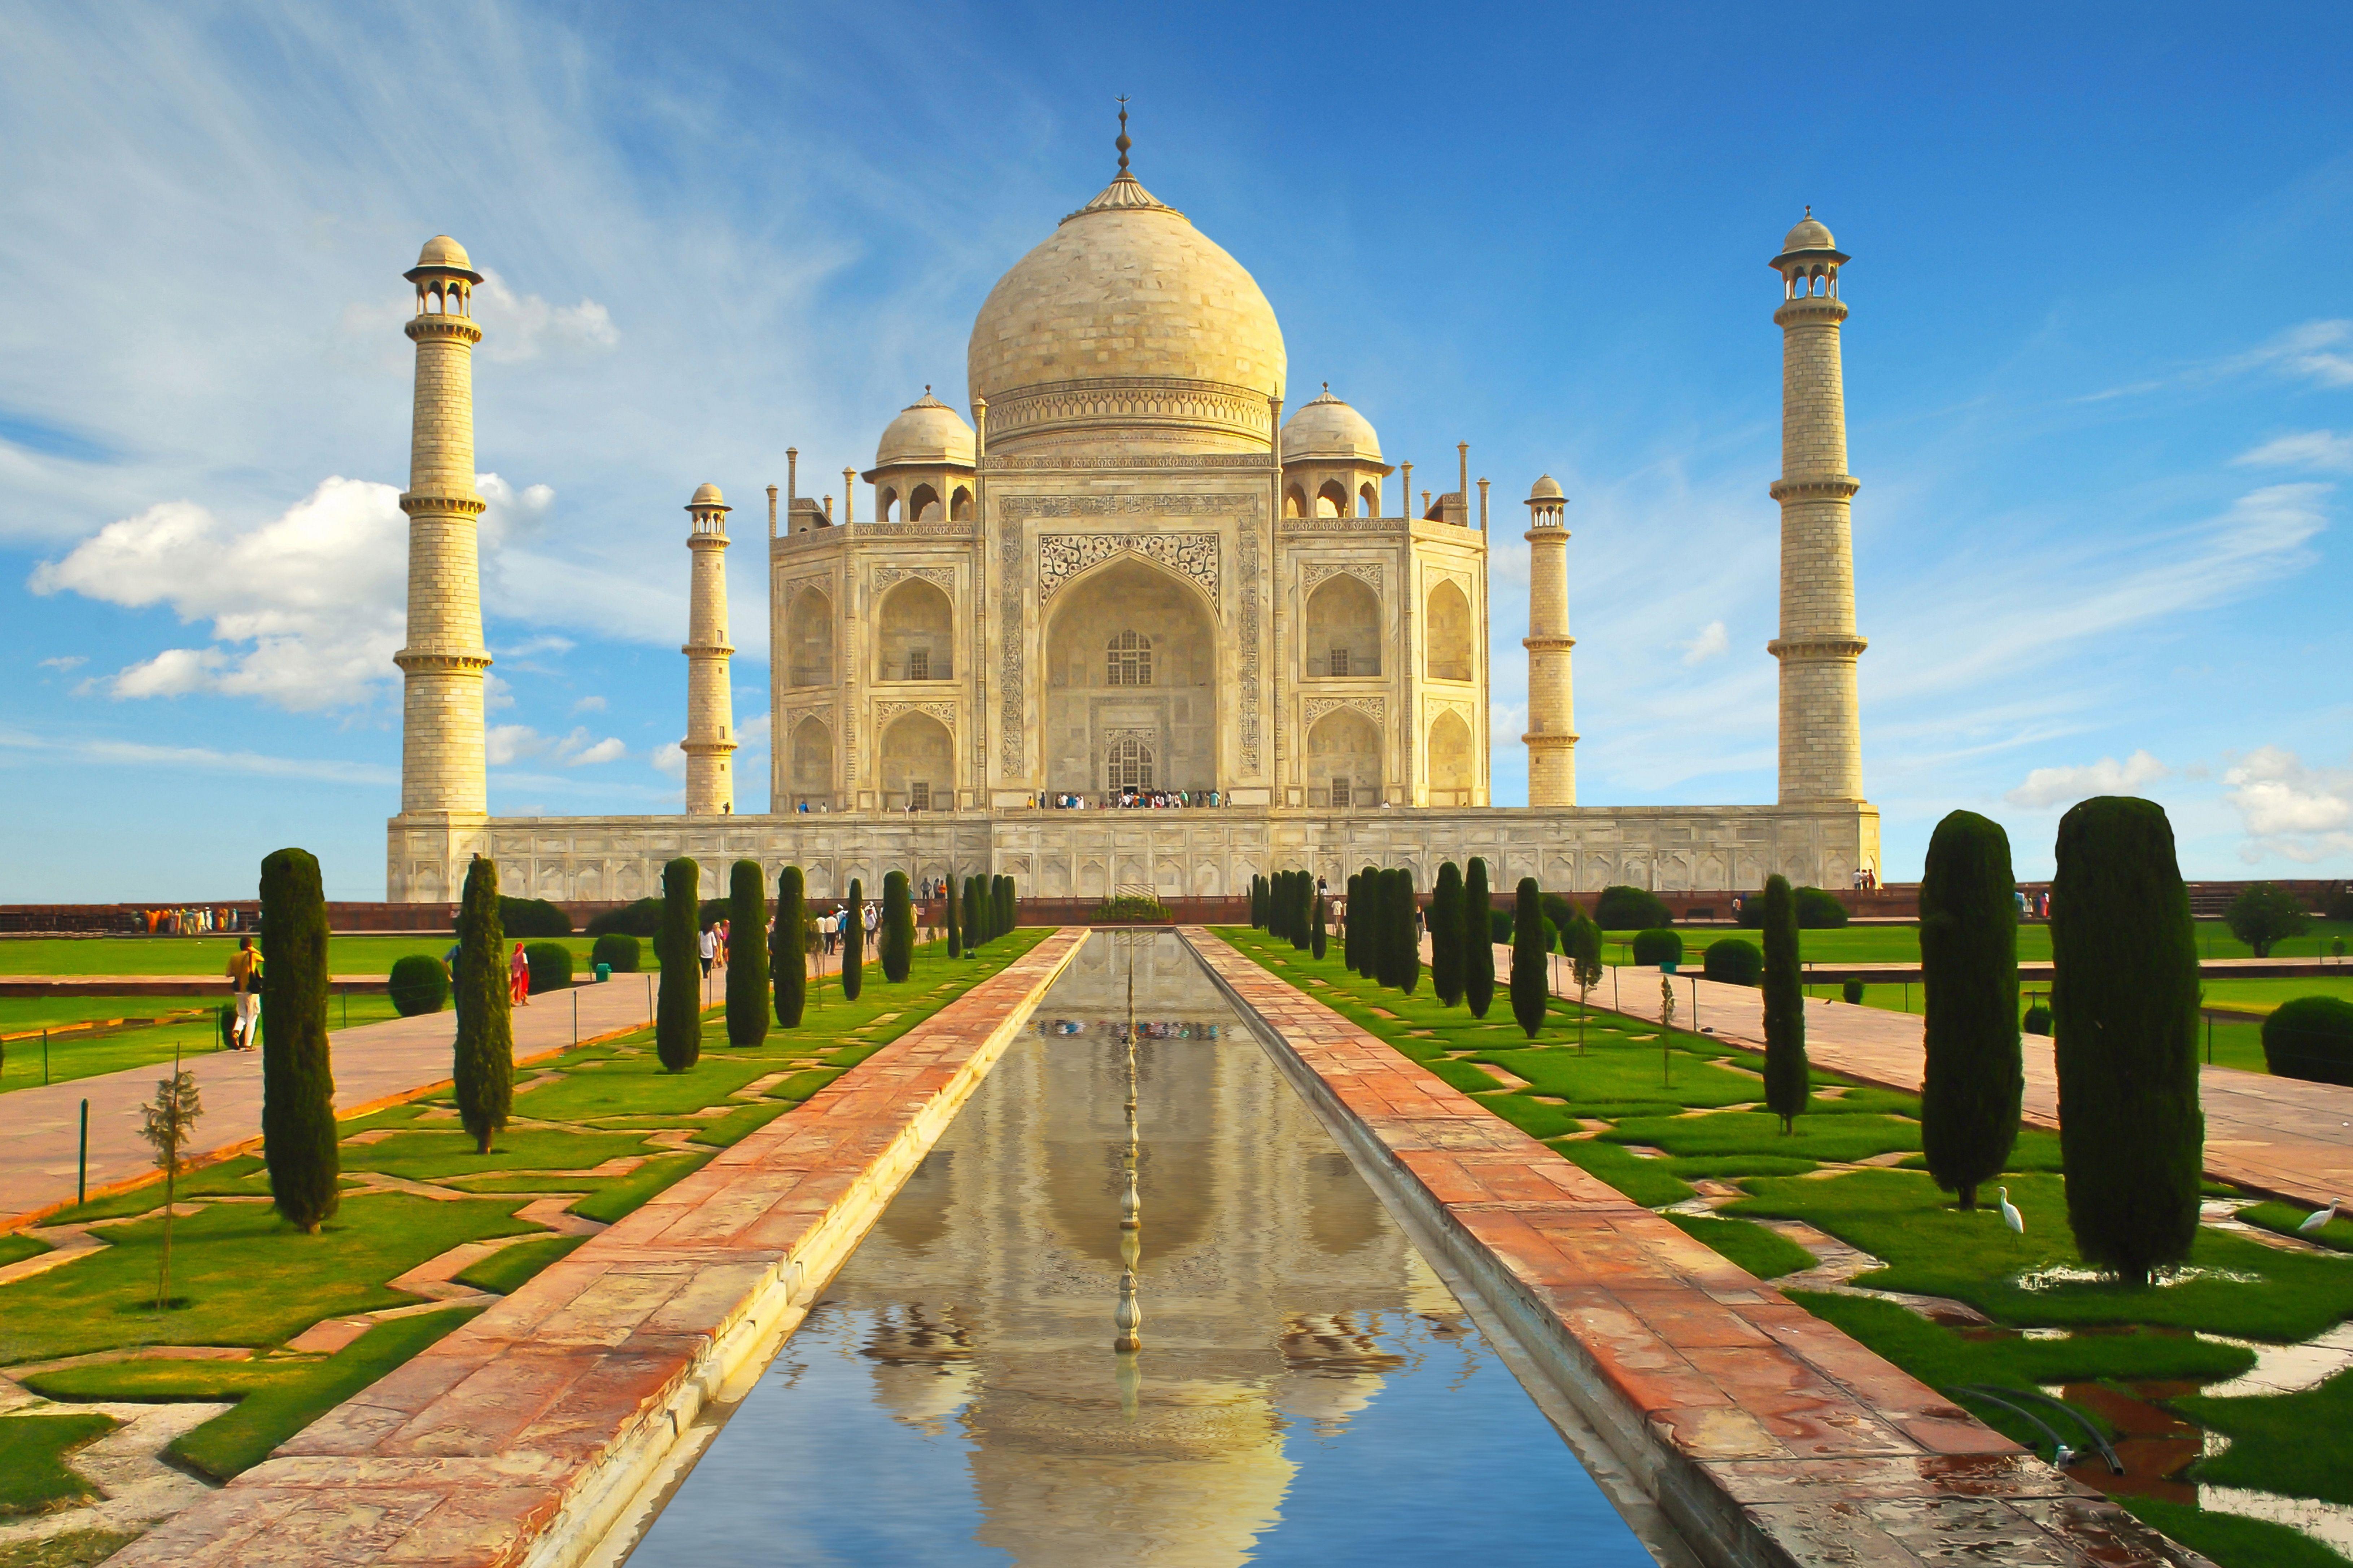 Taj mahal wallpapers top free taj mahal backgrounds - Taj mahal background hd ...